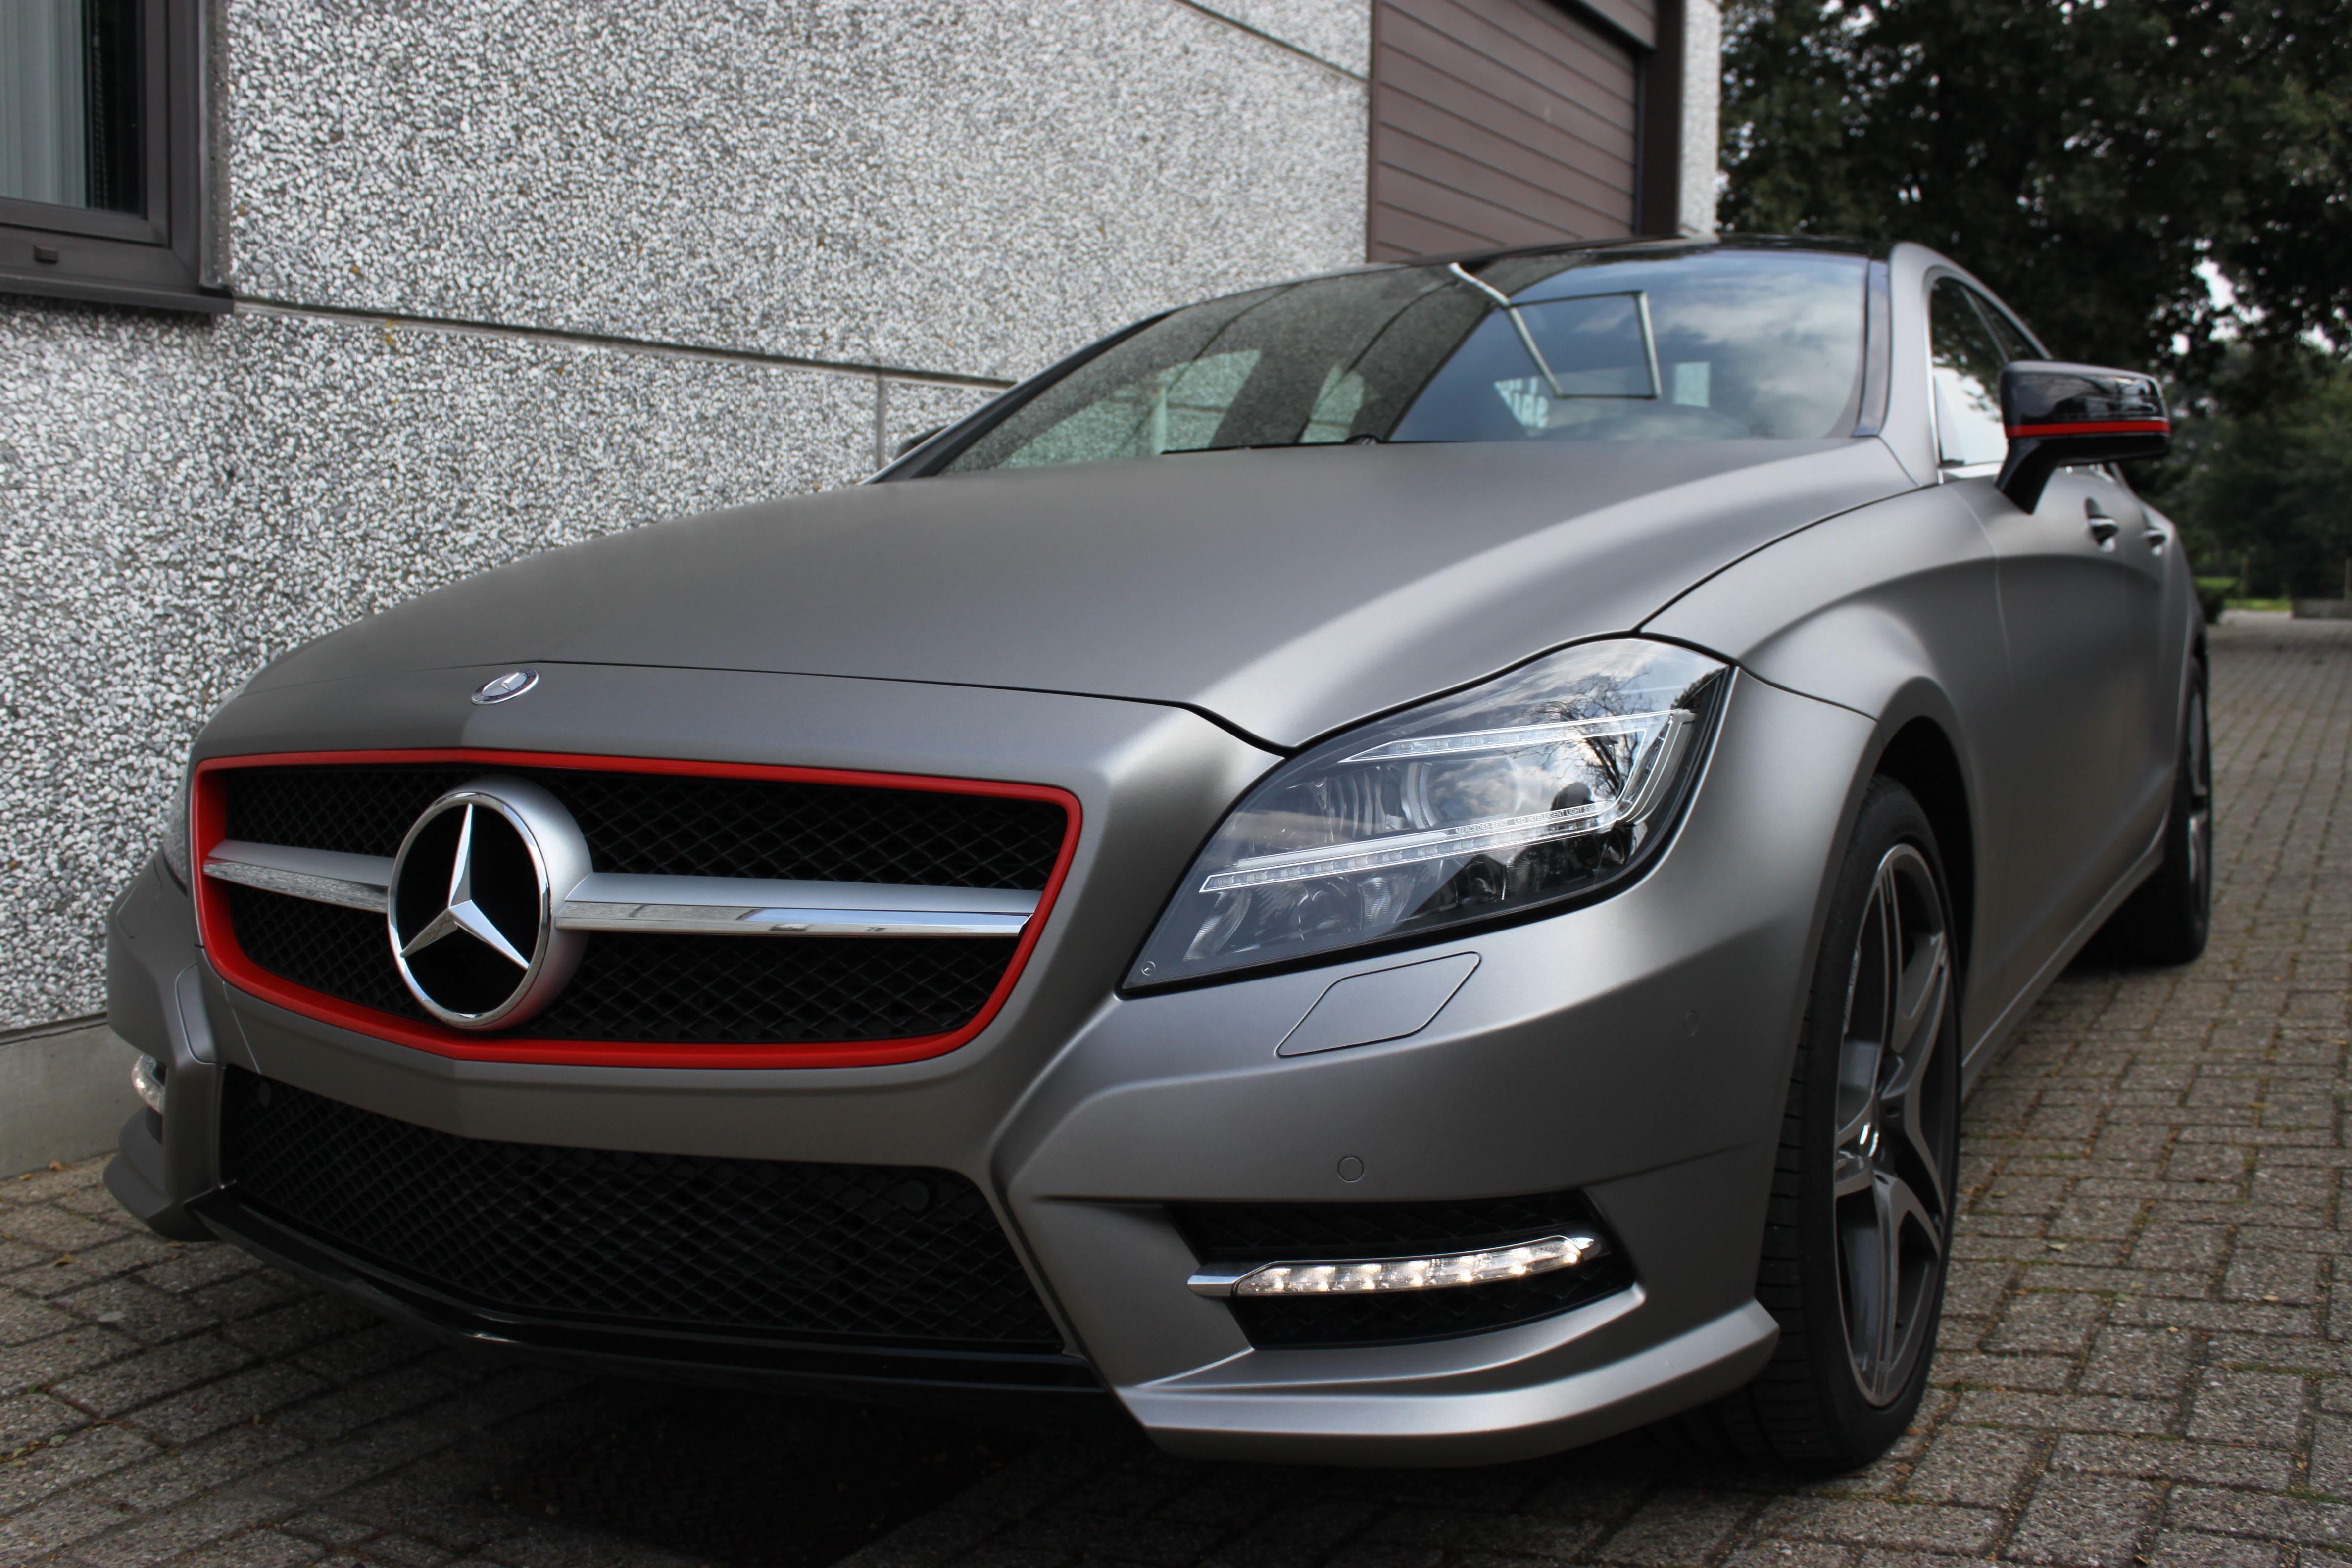 Mercedes CLS met Mat Grey Aluminium Wrap, Carwrapping door Wrapmyride.nu Foto-nr:6146, ©2020